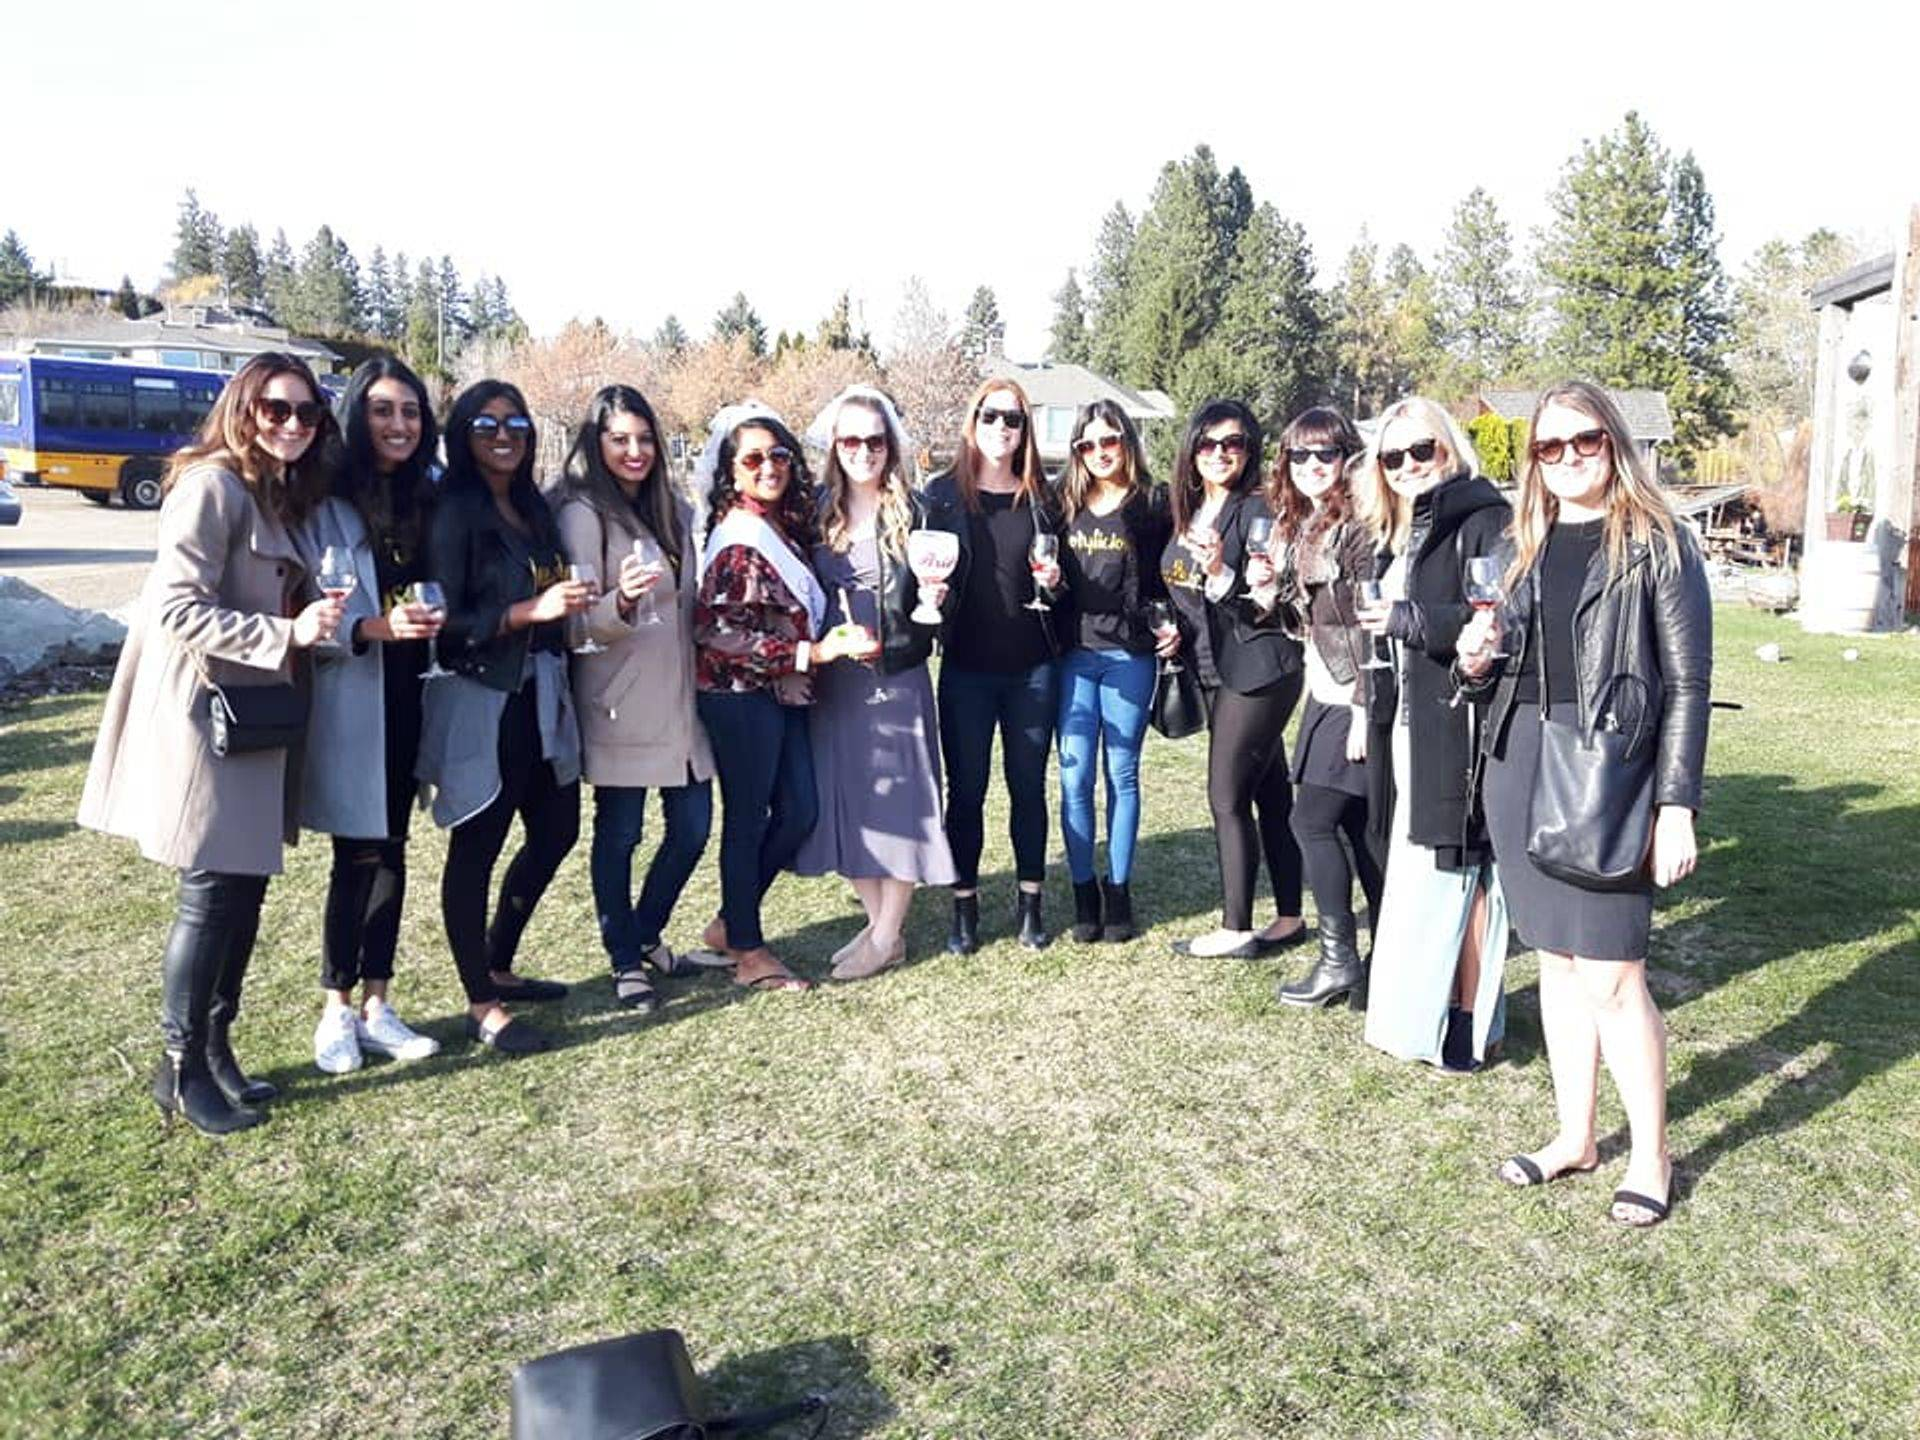 Kelowna #1 Bachelorrette Wine Tour  at Say Hi to Okanagan Tours.